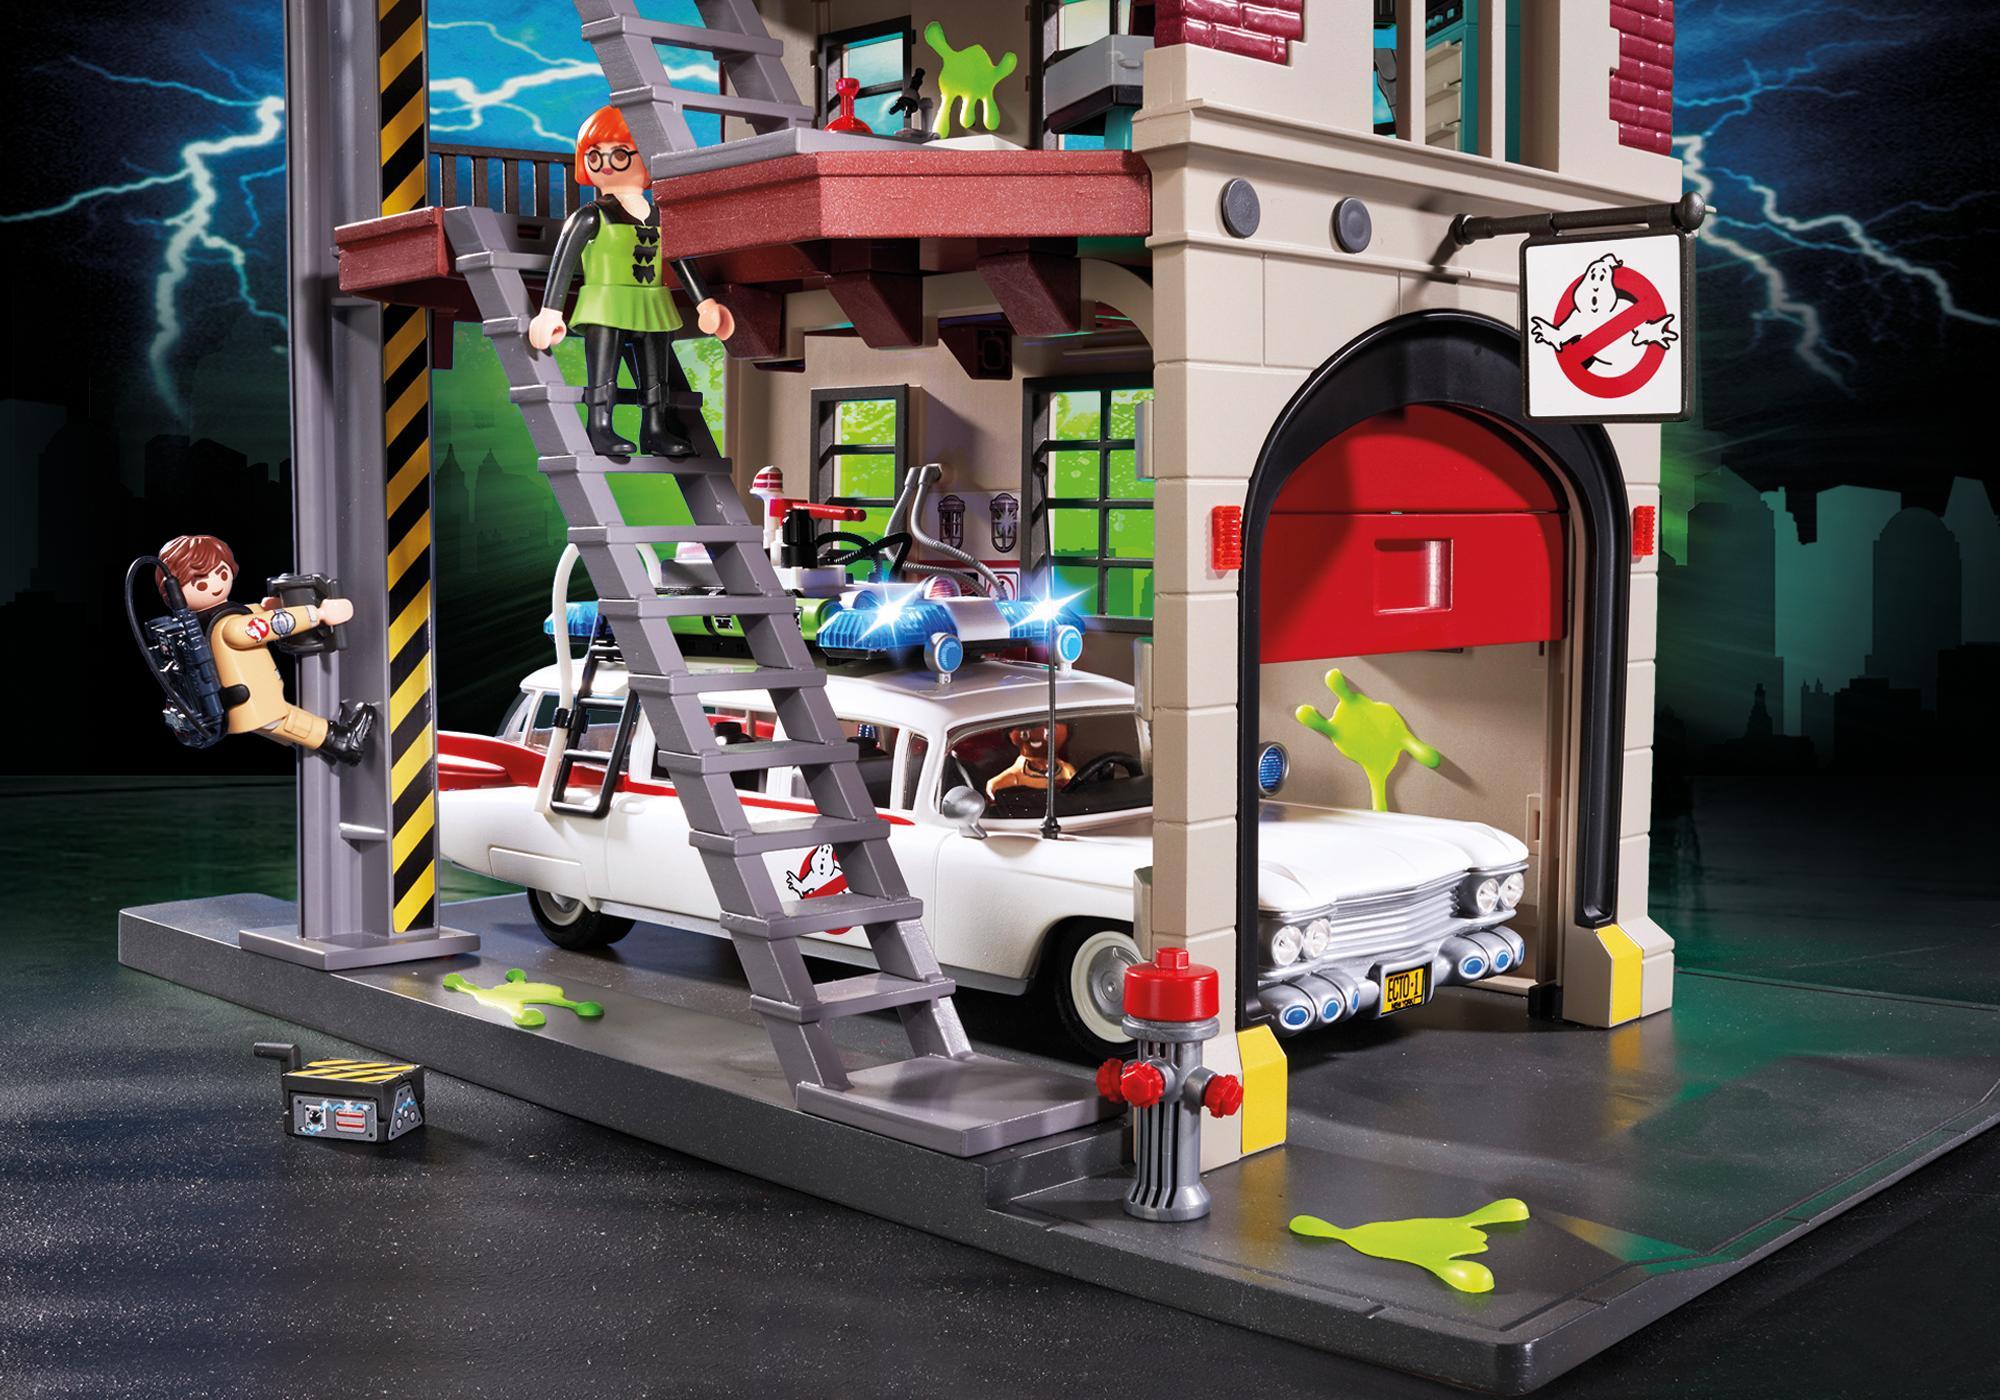 http://media.playmobil.com/i/playmobil/9220_product_extra1/Автомобиль Экто-1